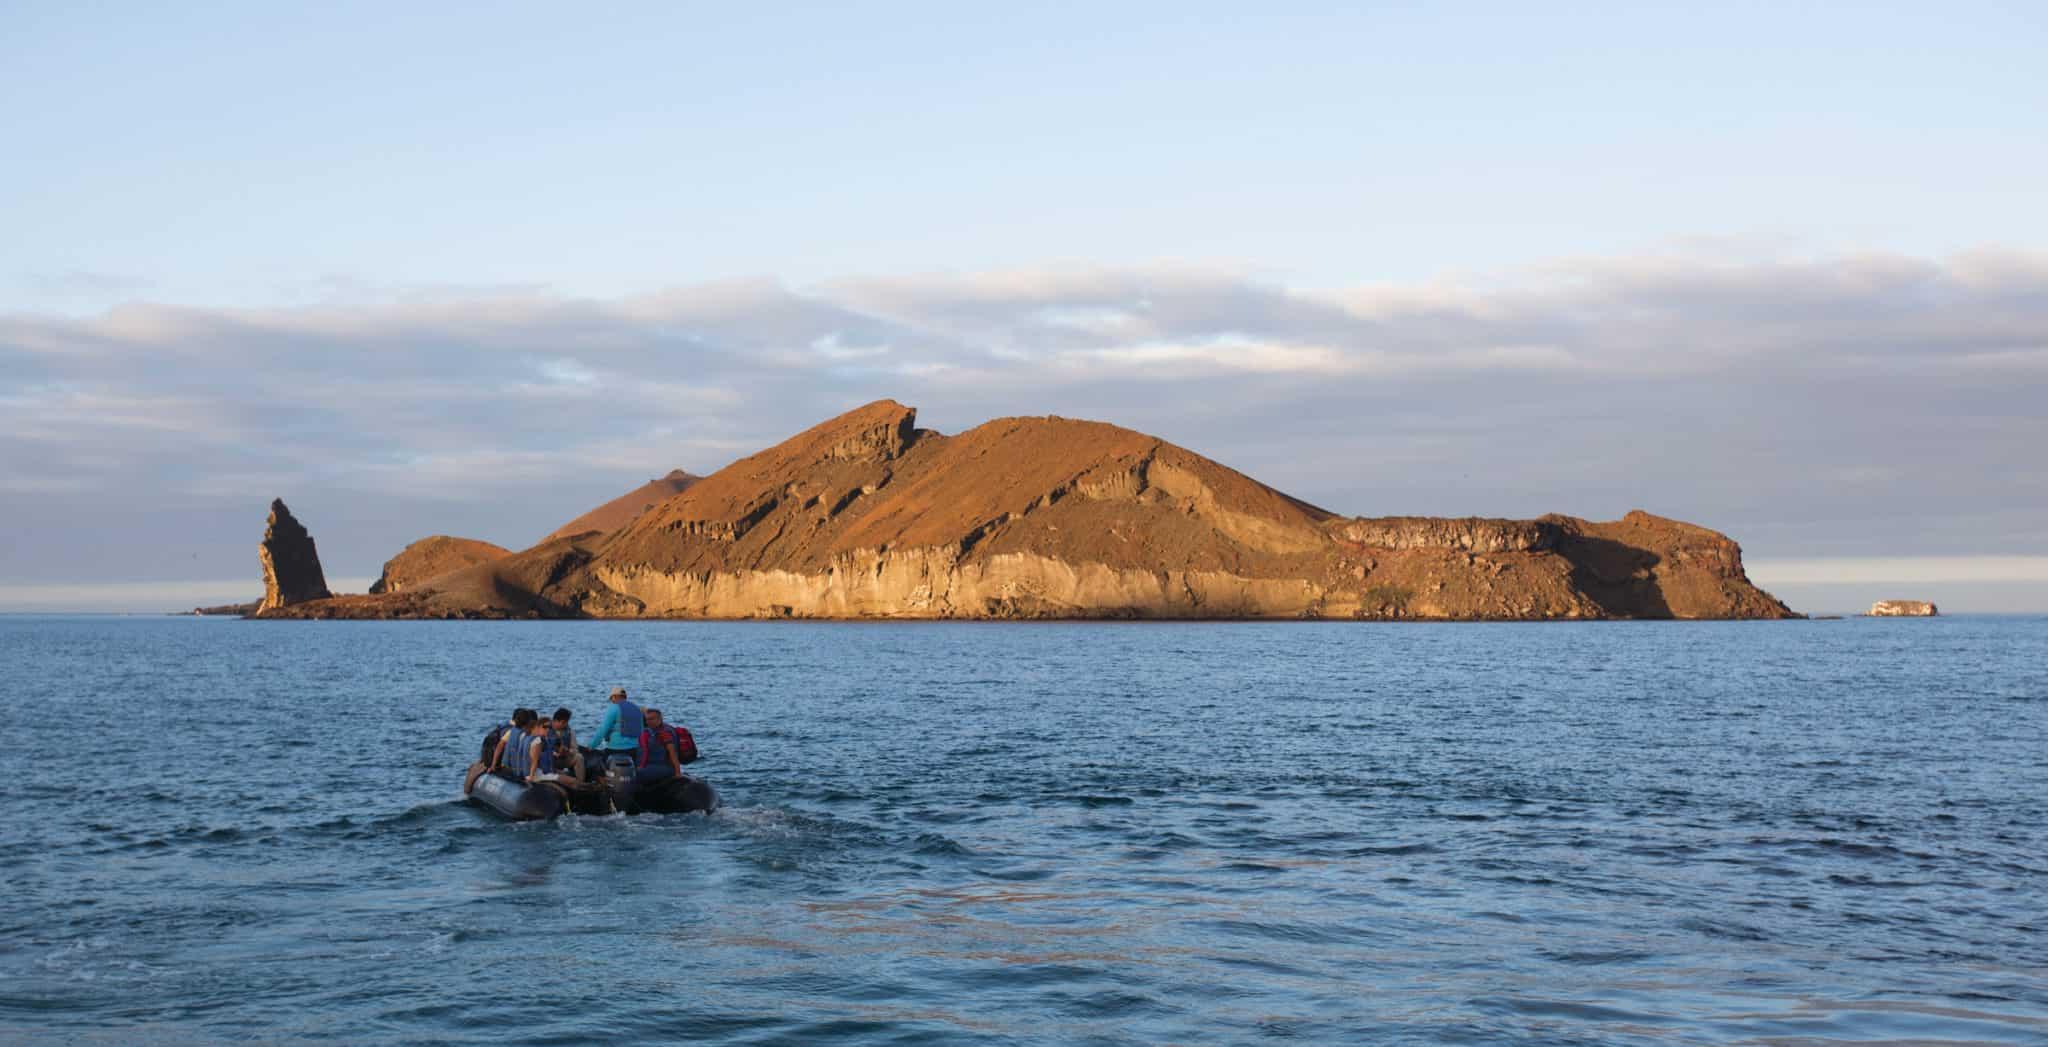 sullivan bay, santiago island, galapagos